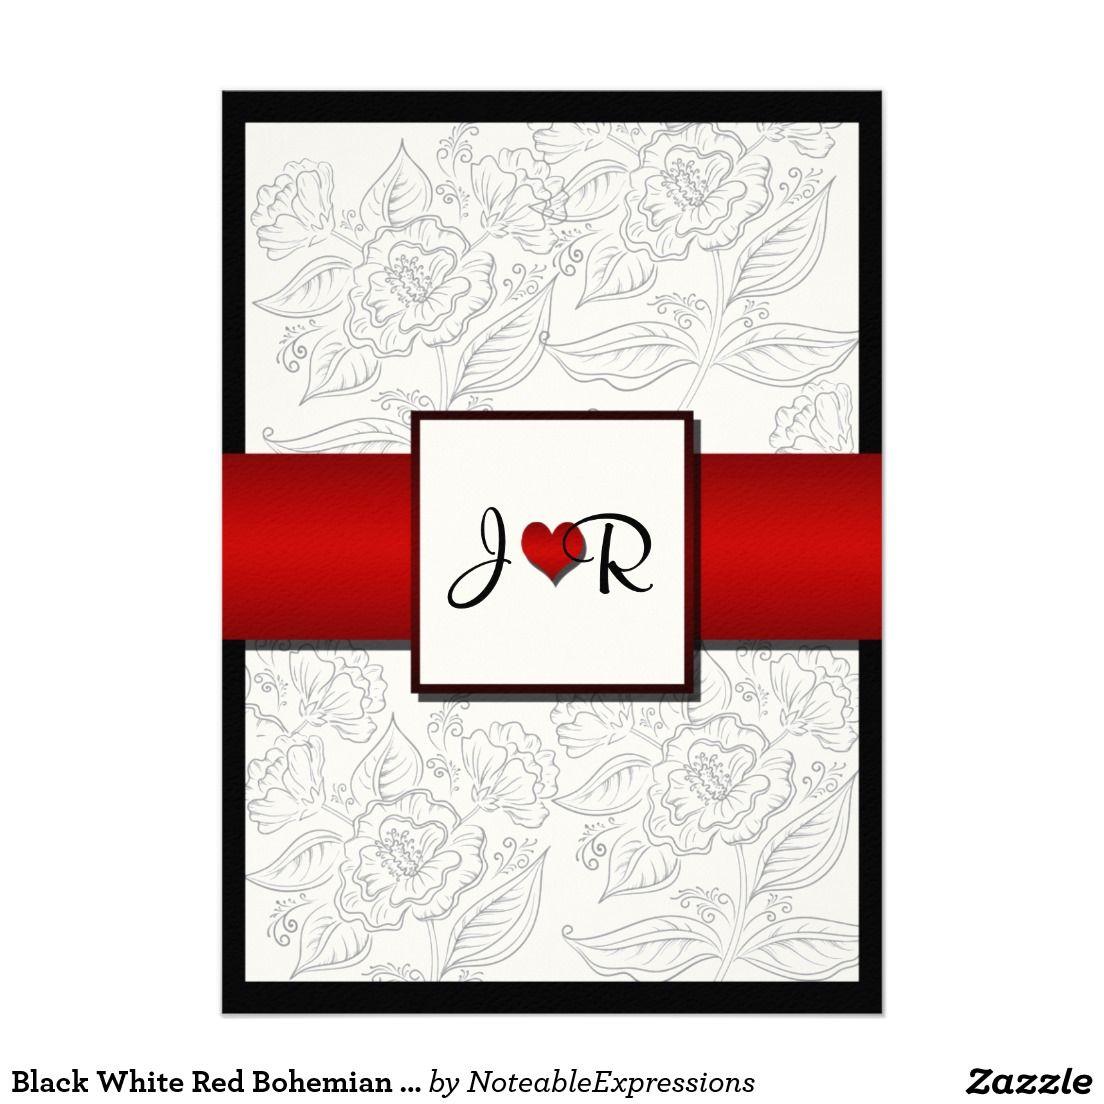 Black White Red Bohemian Posh Wedding Invitation | Black white red ...